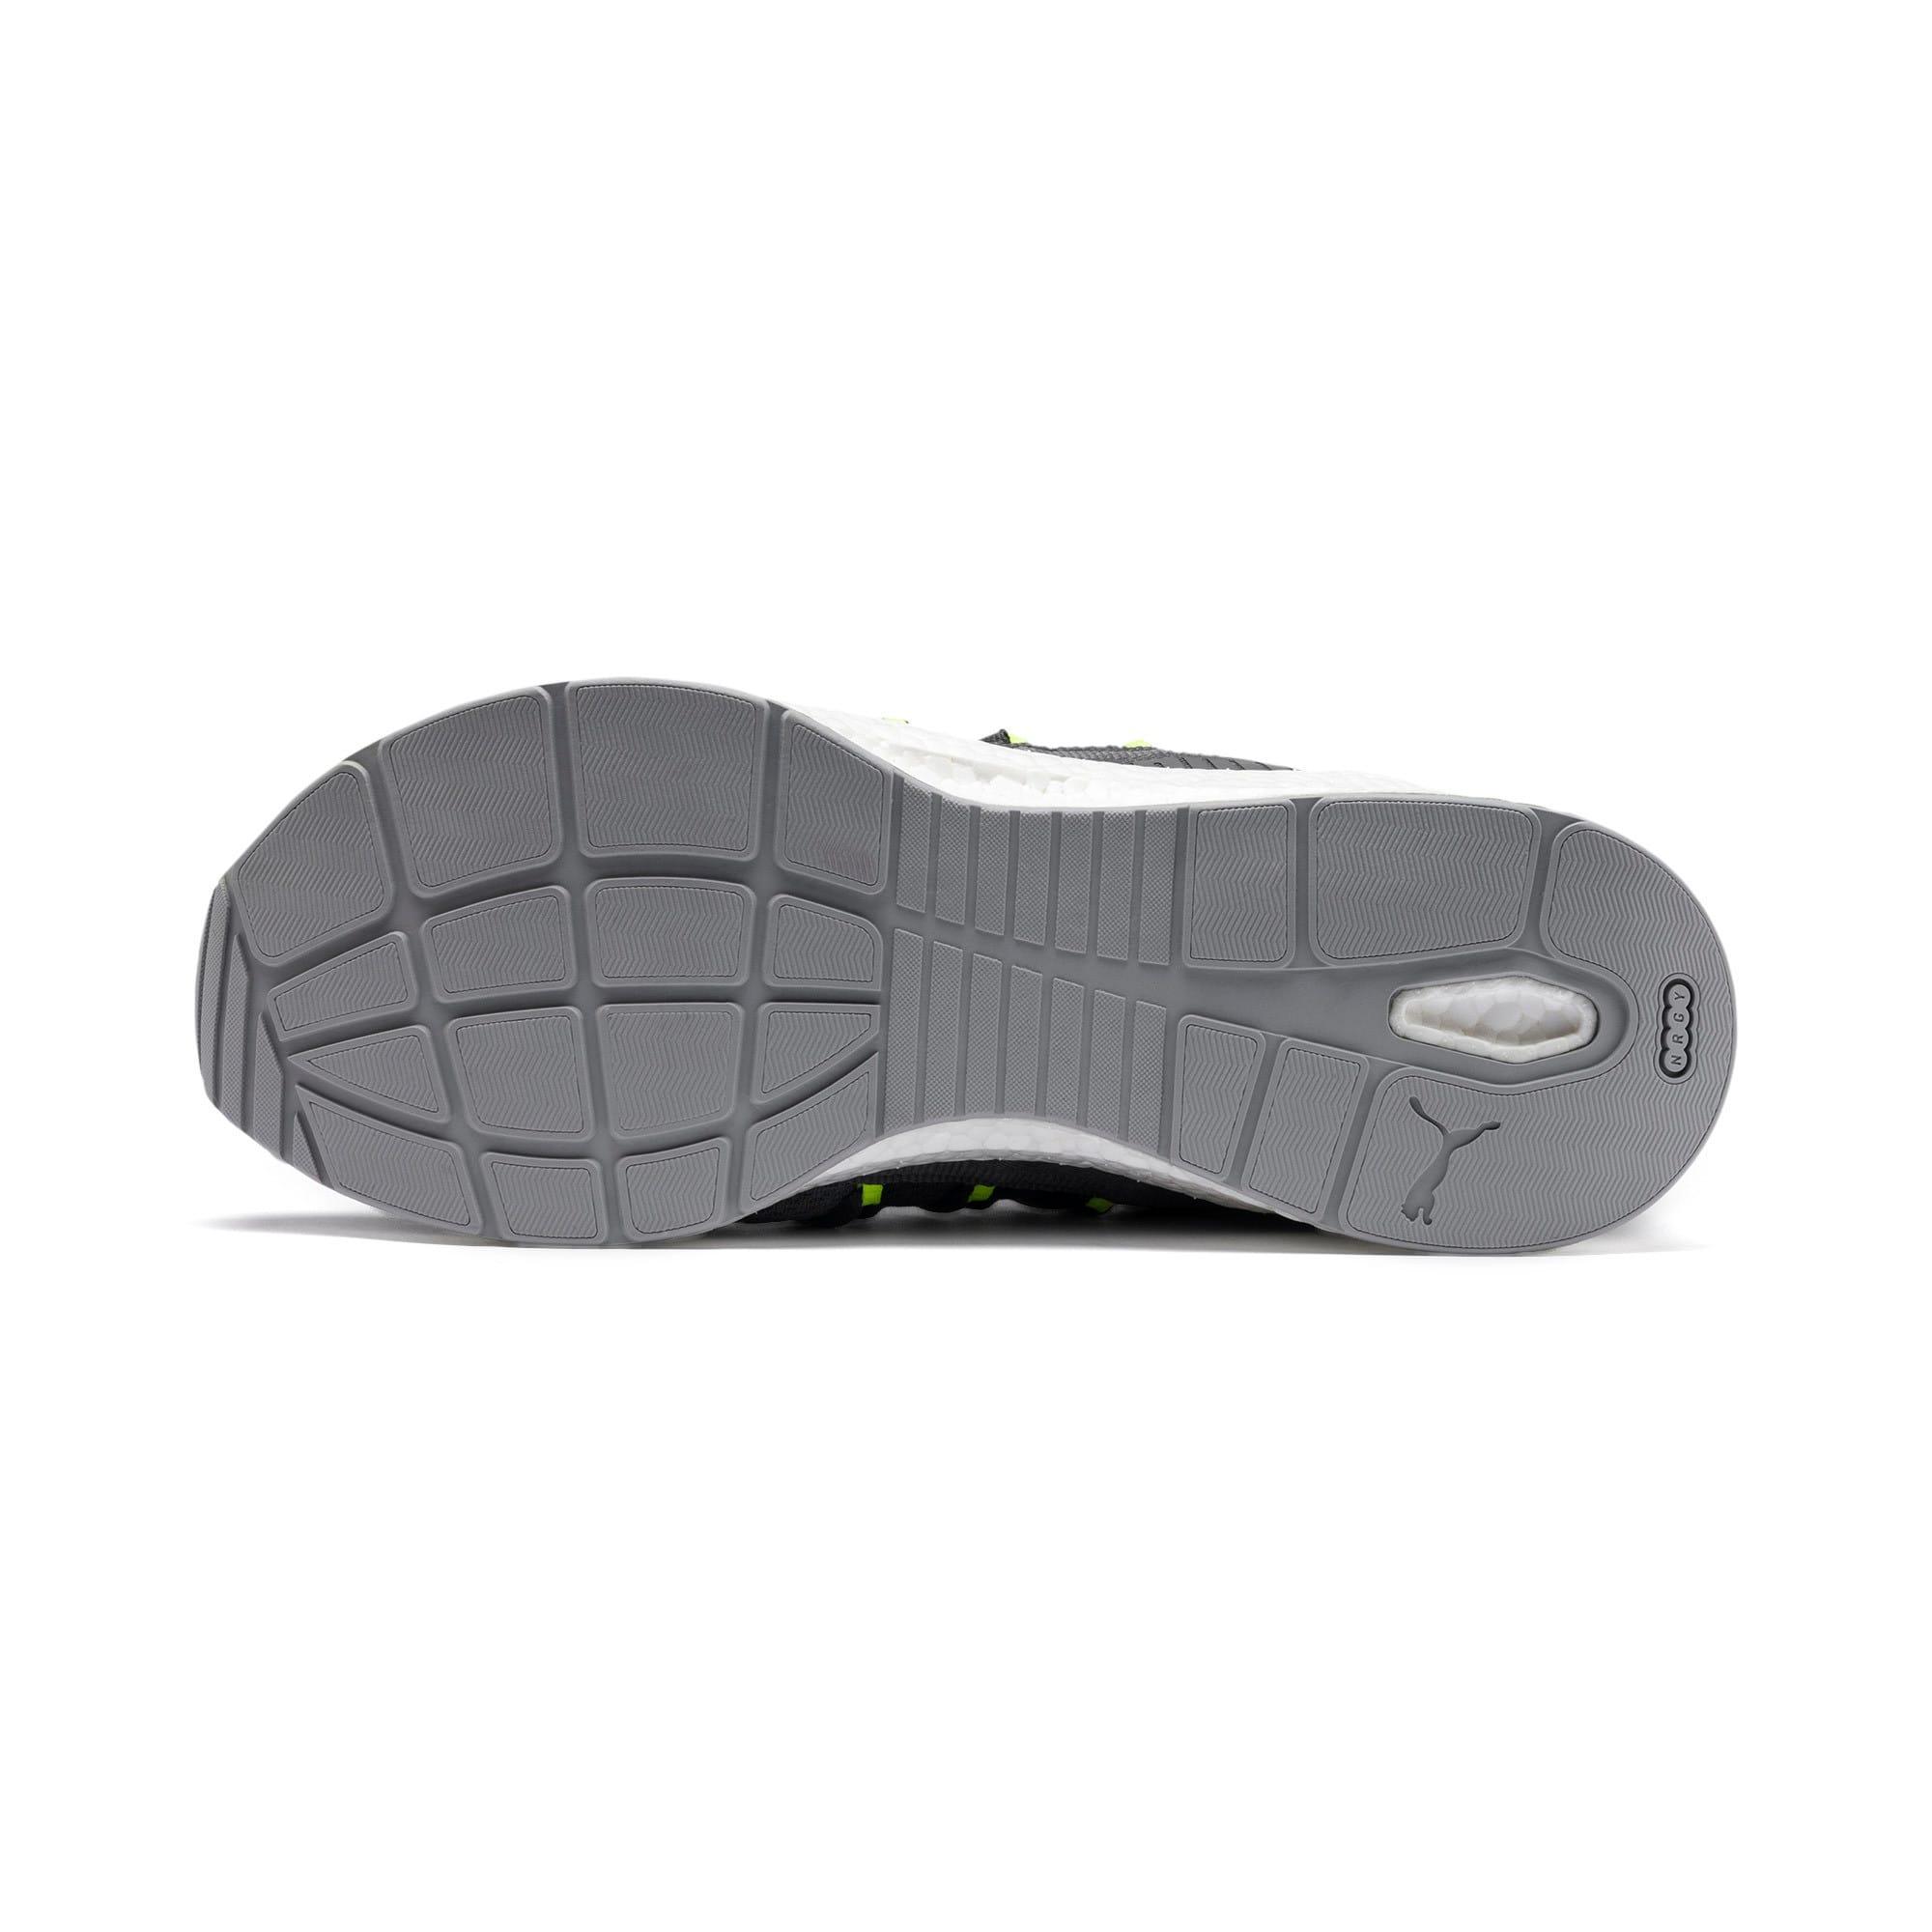 Thumbnail 5 of NRGY Star Running Shoes, CASTLEROCK-White-Yellow, medium